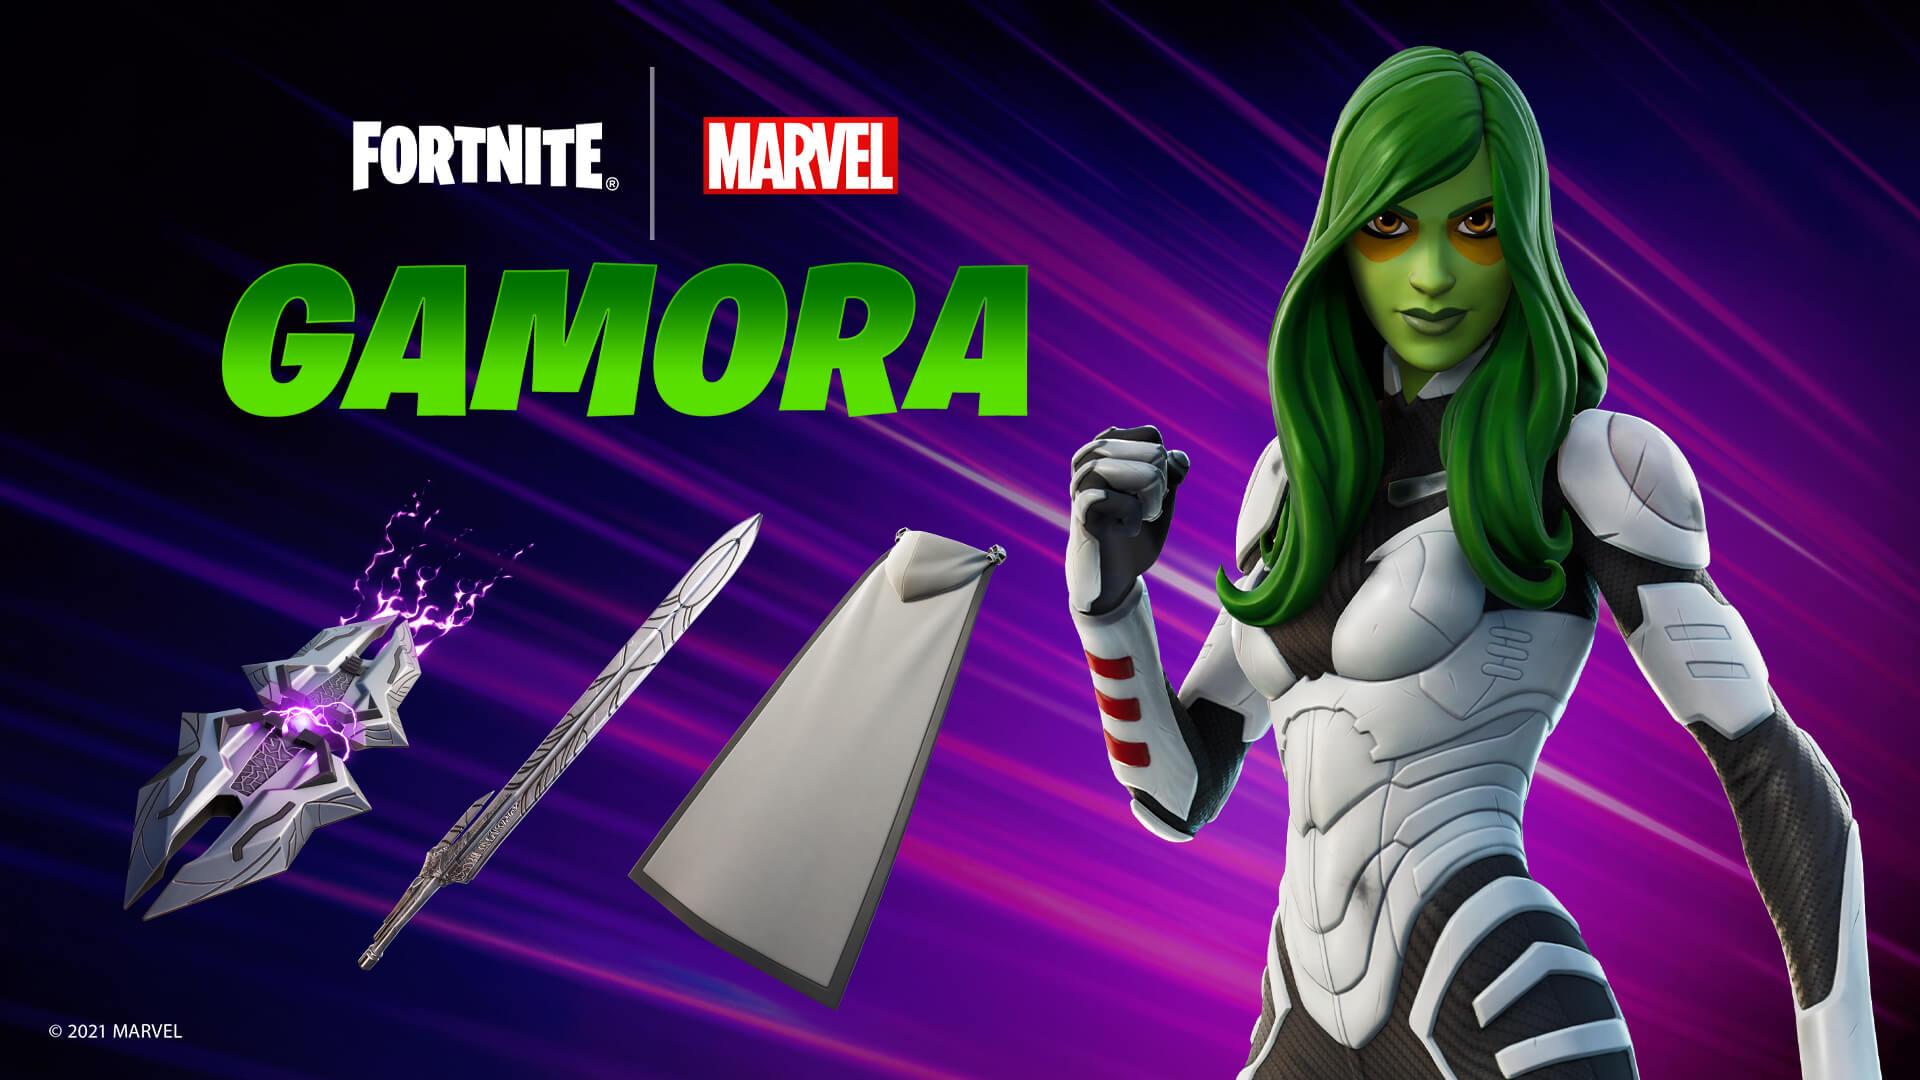 Fortnite Gamora Outfit